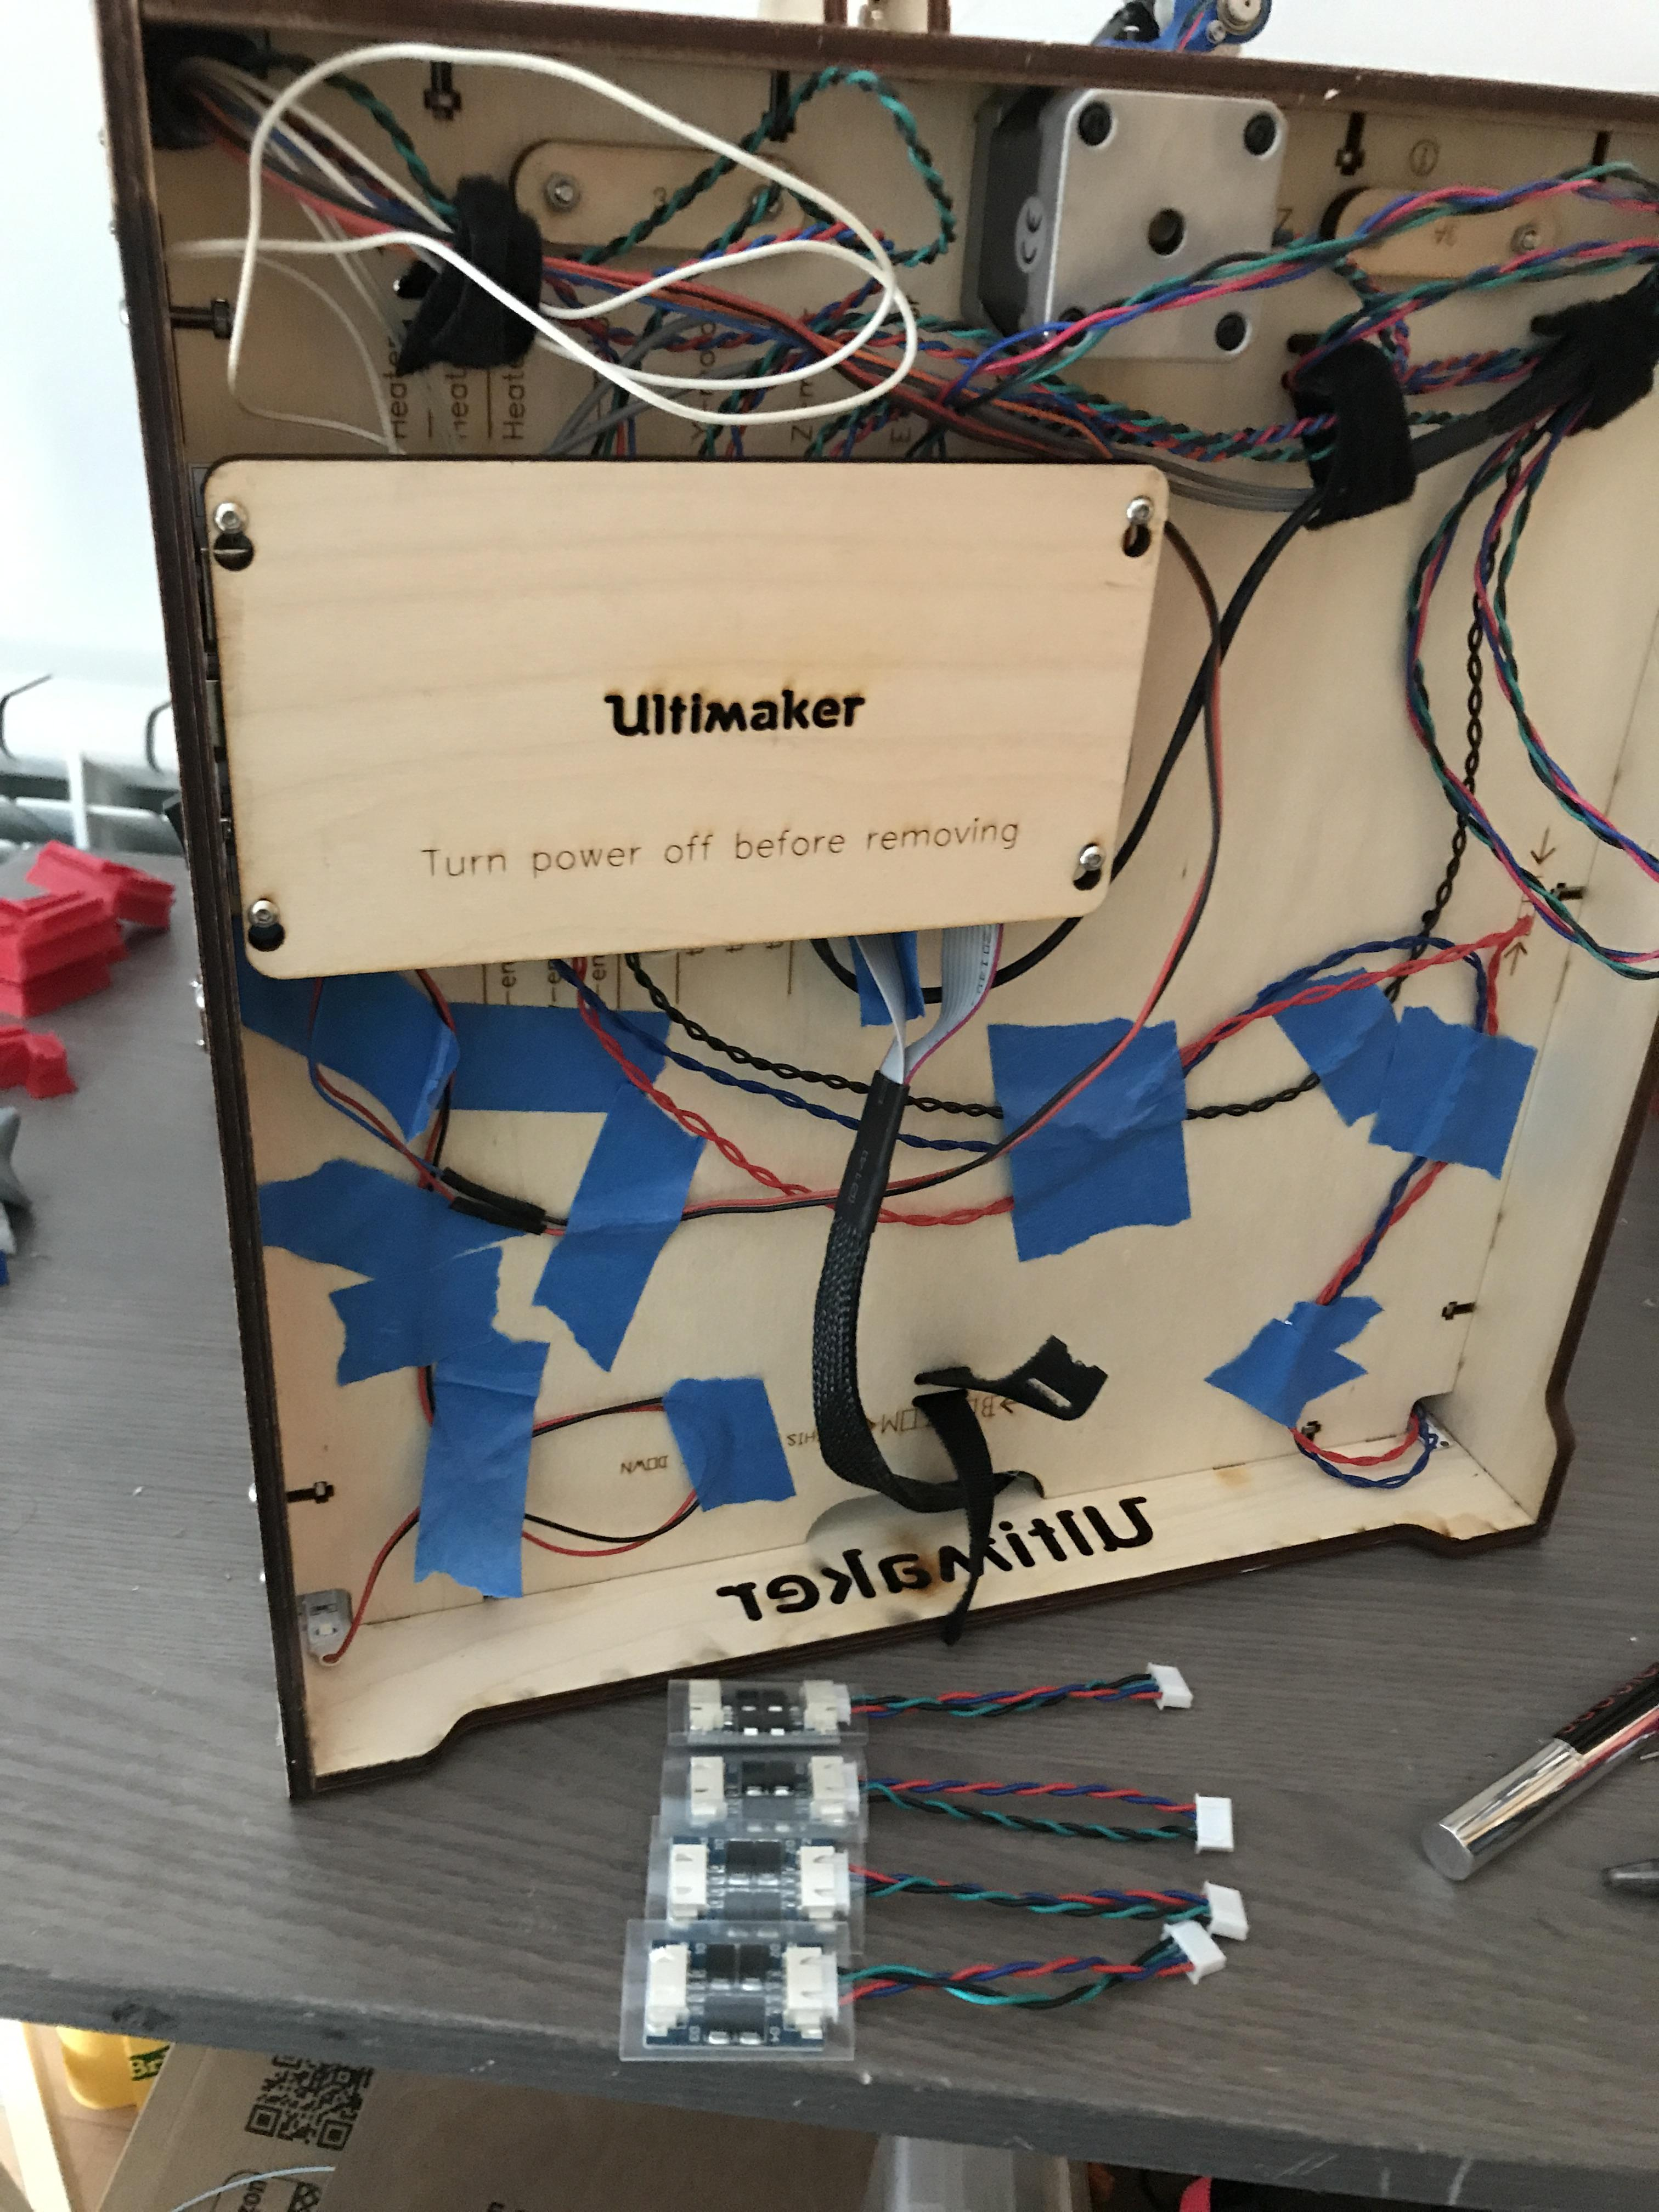 Manual How To Install Tl Smooth Zebra Strippes Fix Umo Um2 4 Wire Stepper Motor Wiring Harness Img 7852thumbb1b73074add4c01378e18ceefafa399f